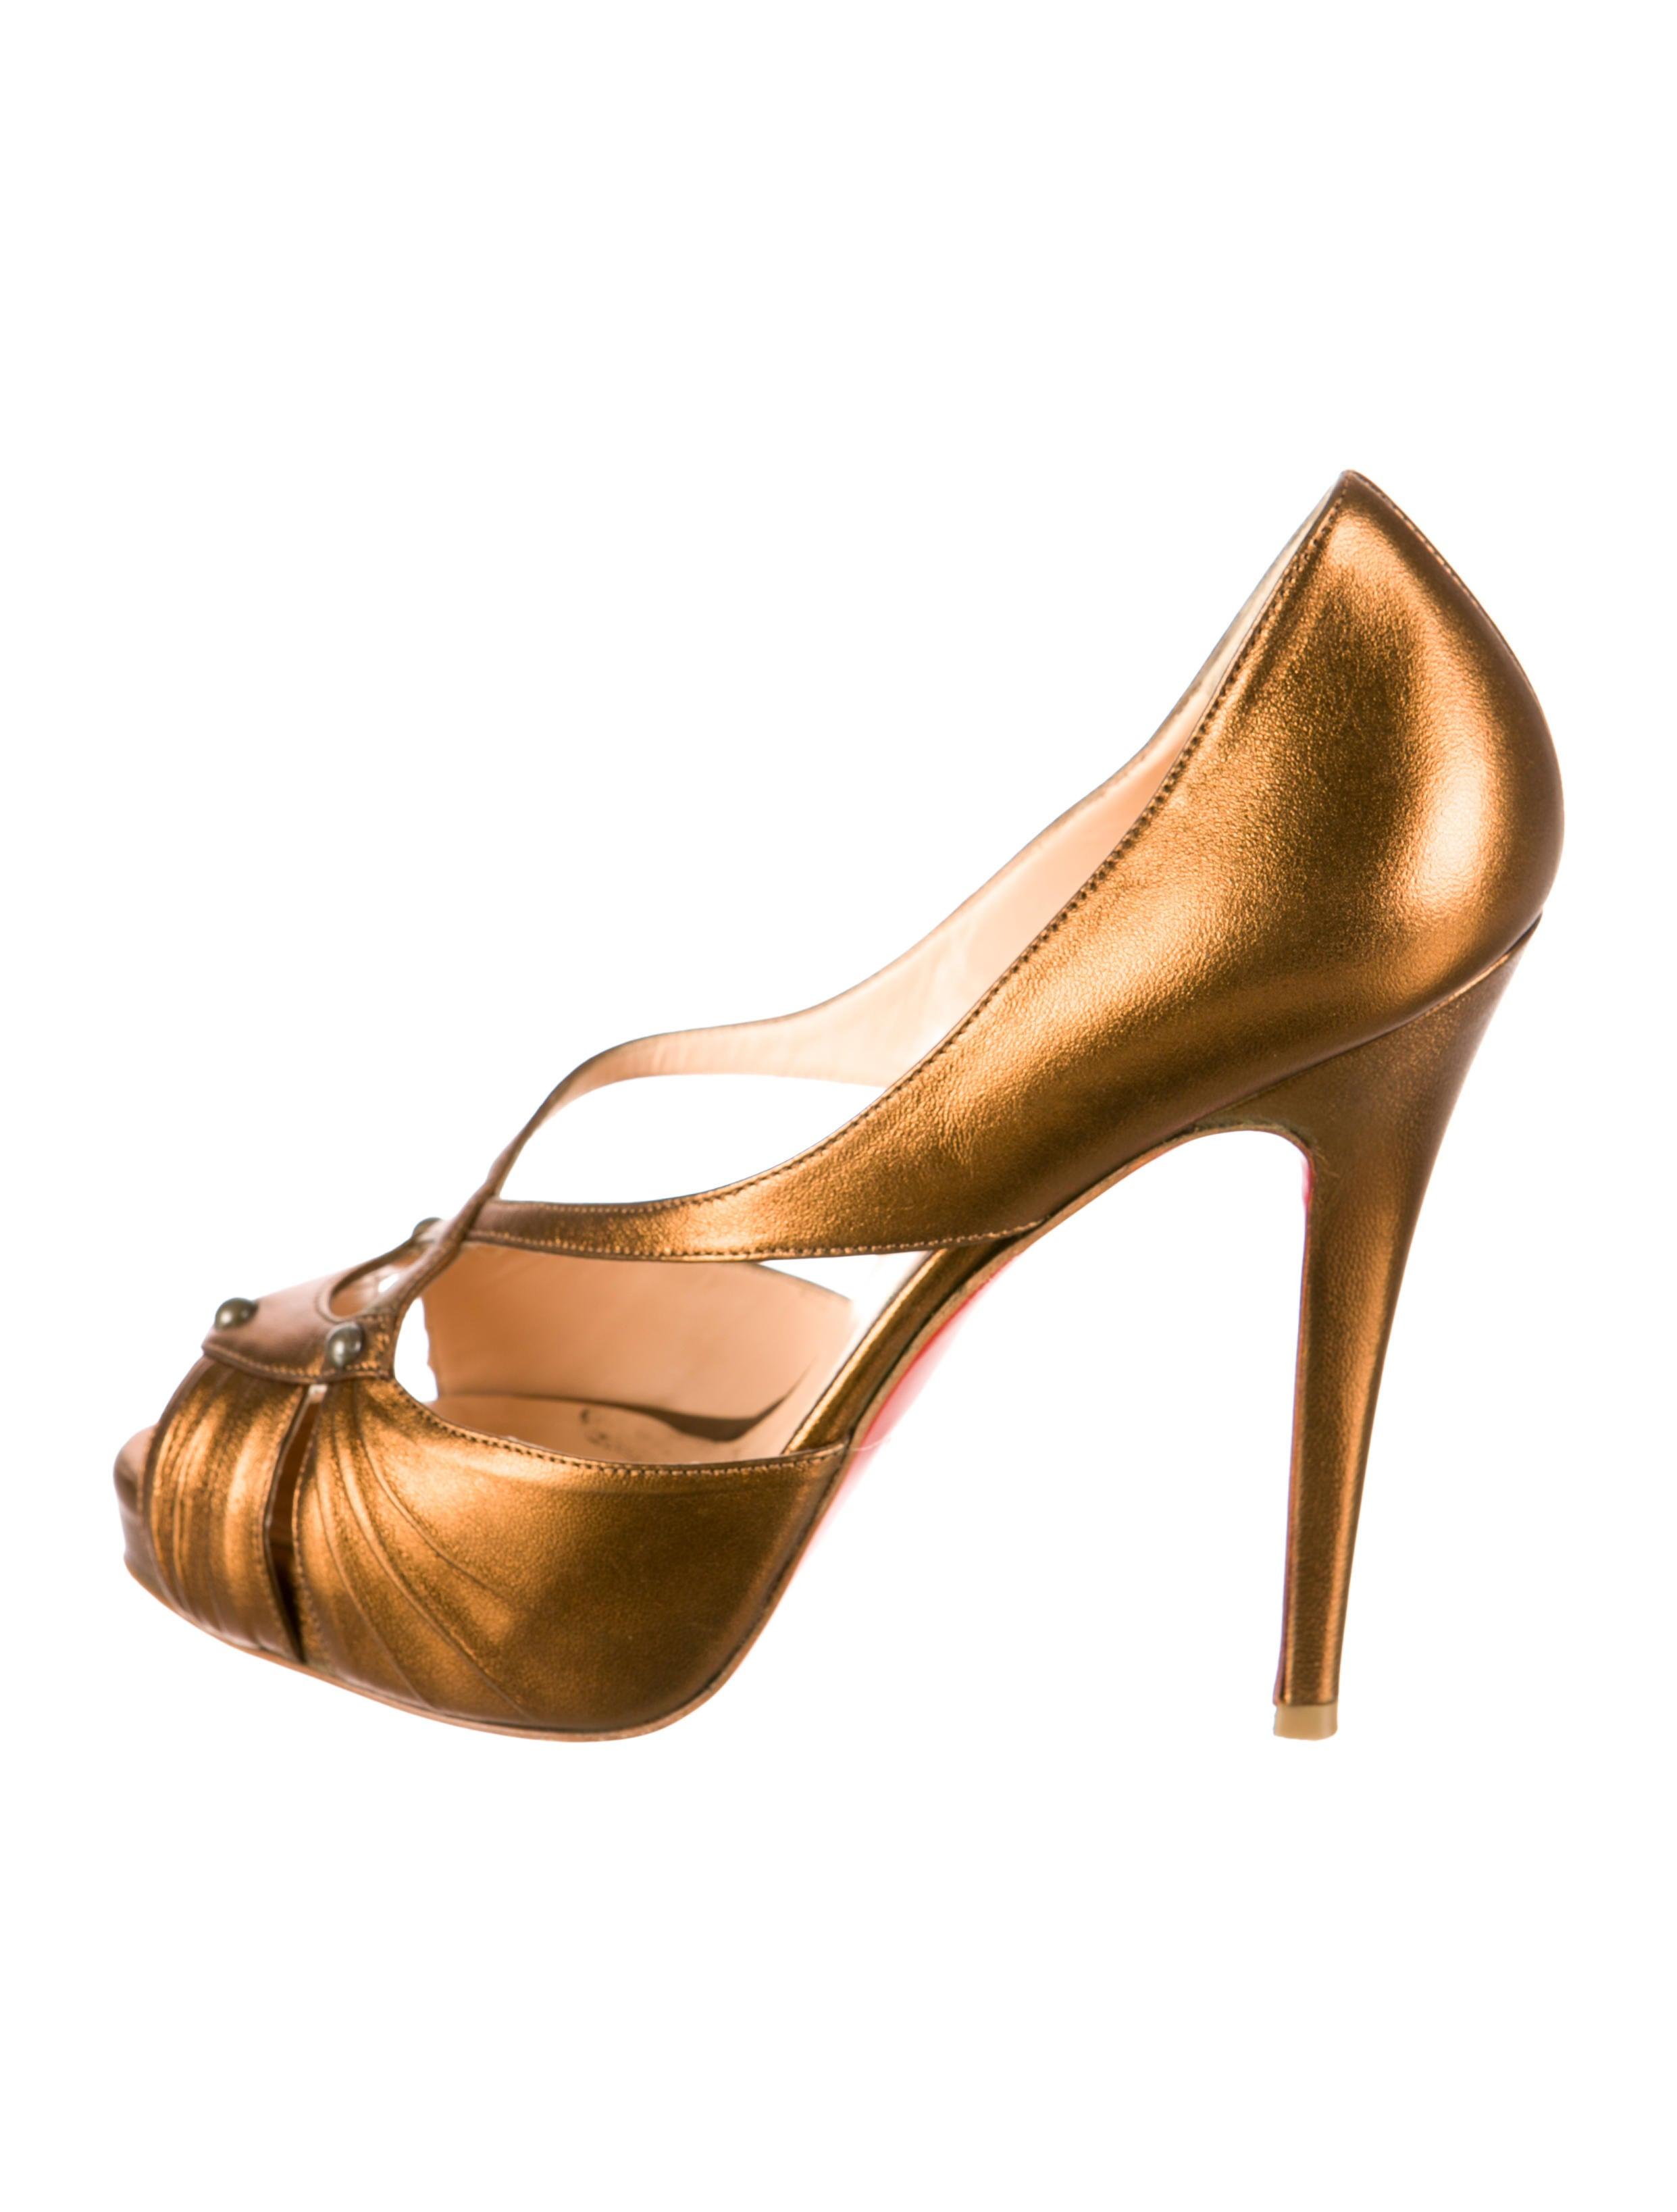 louboutin.com shoes - christian louboutin Scissor Girl peep-toe pumps Copper metallic ...